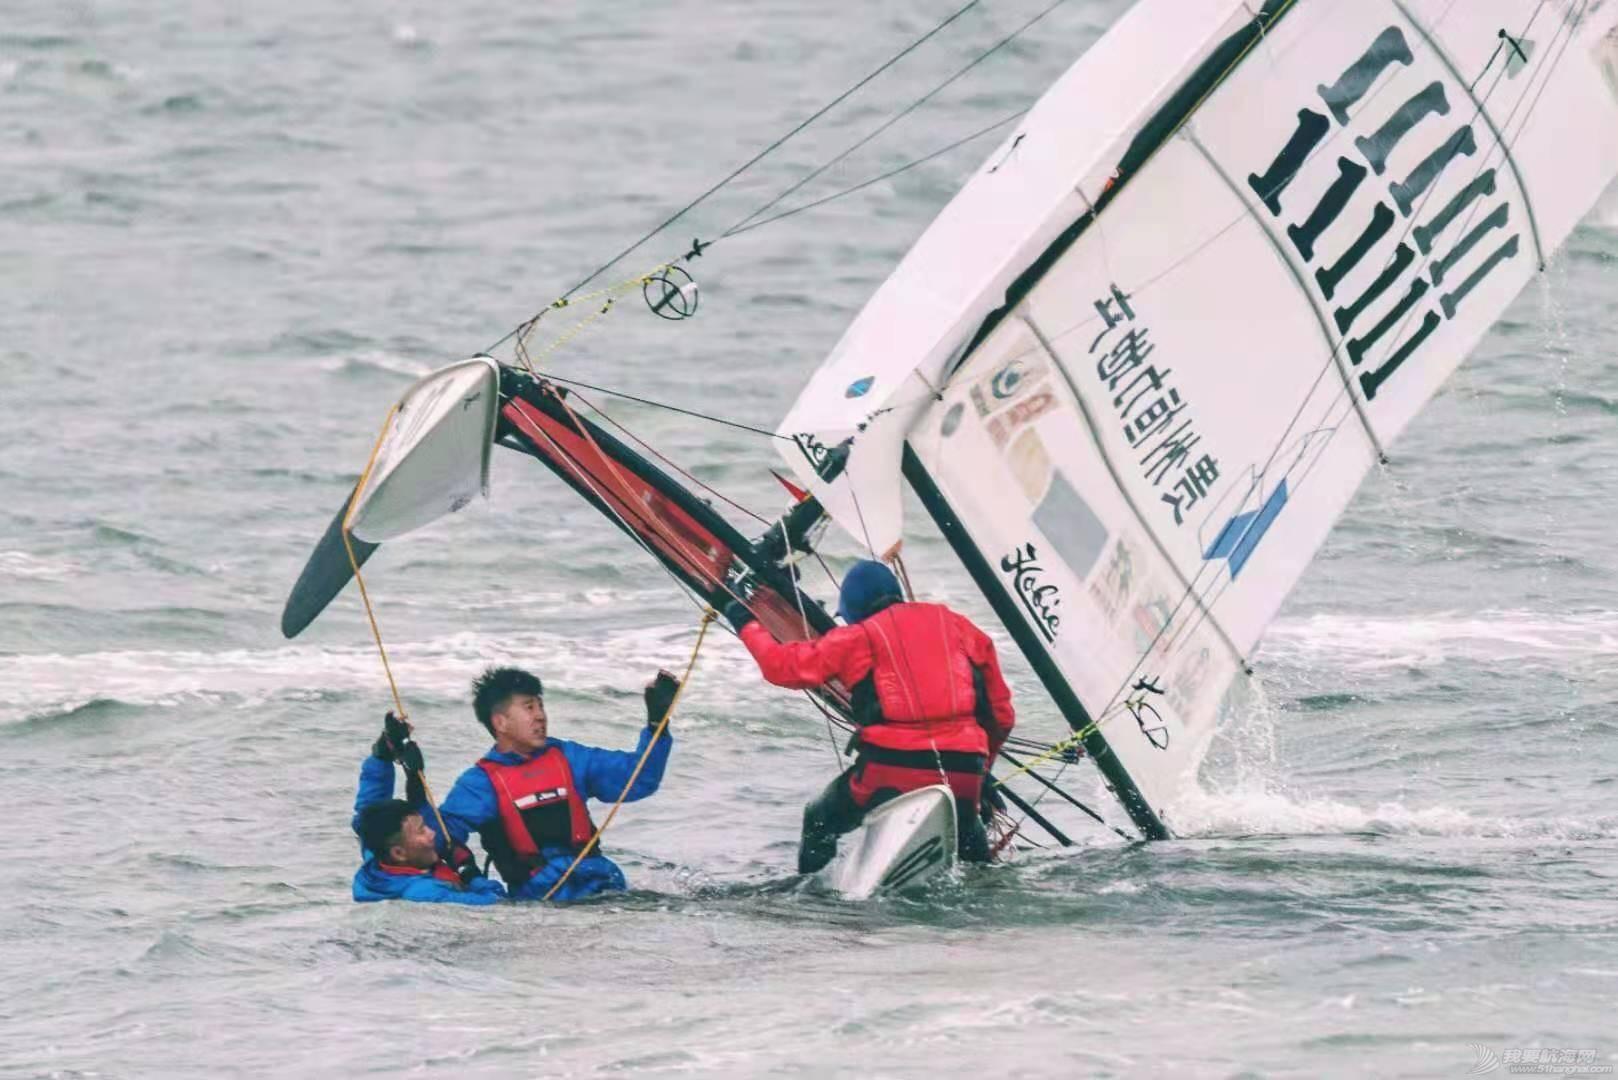 nbsp,广西,帆船,级别,岭南 你若喜欢海  我会一直浪  ——2020北部湾国际帆船公开赛Hobie级别回顾  111033bqupdbiqepddeibw